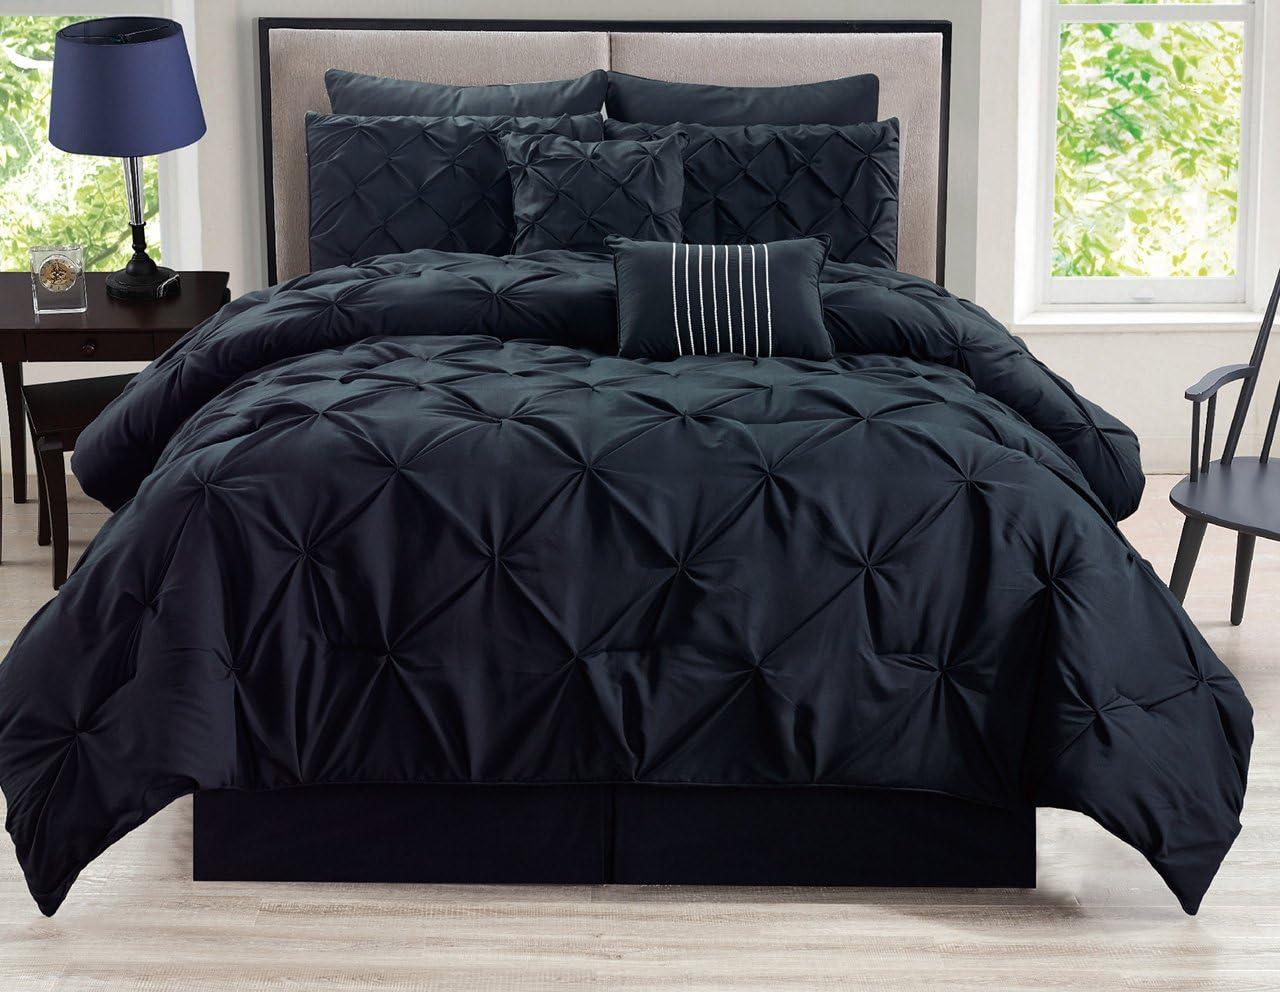 Amazon Com 8 Piece Rochelle Pinched Pleat Black Comforter Set